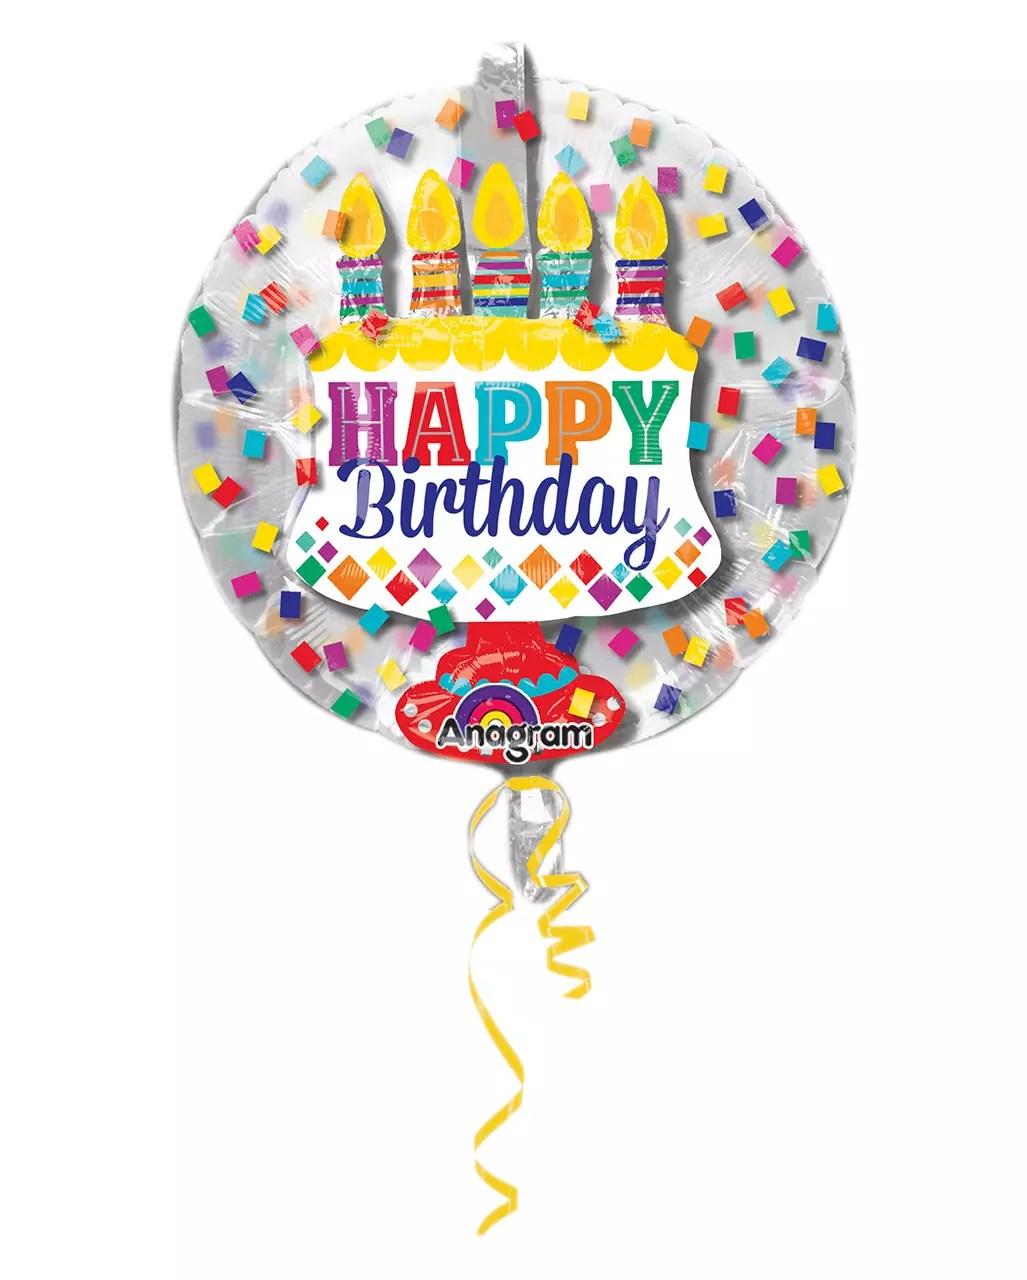 Happy Birthday Balloon In Balloon 60cm Horror Shop Com